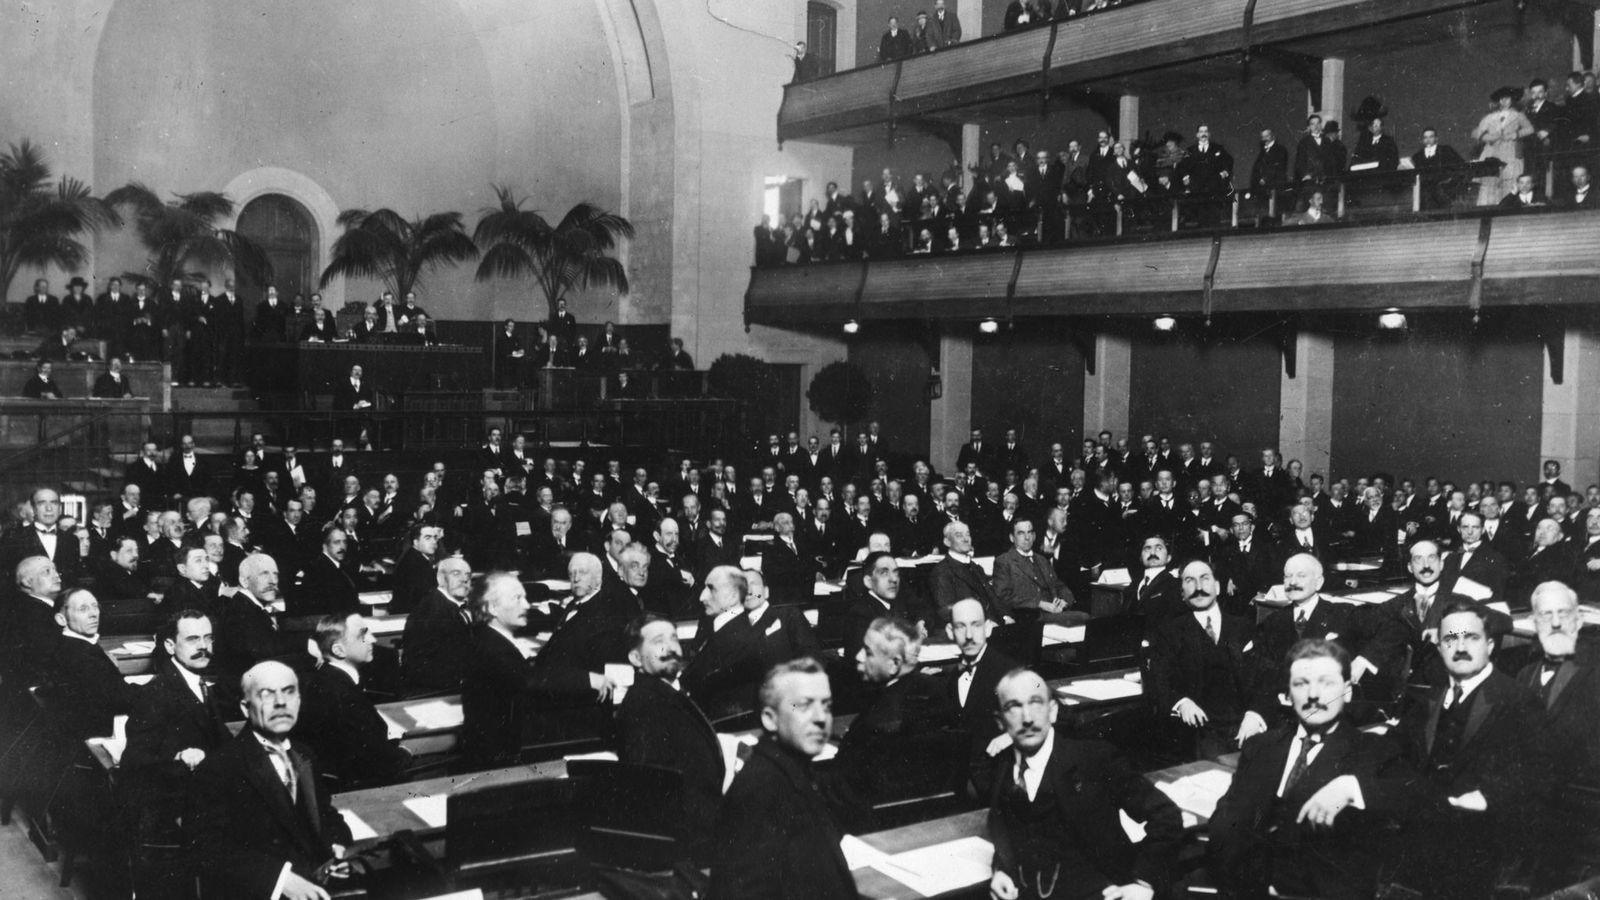 Members of the League of Nations convene in Geneva, Switzerland in 1920.